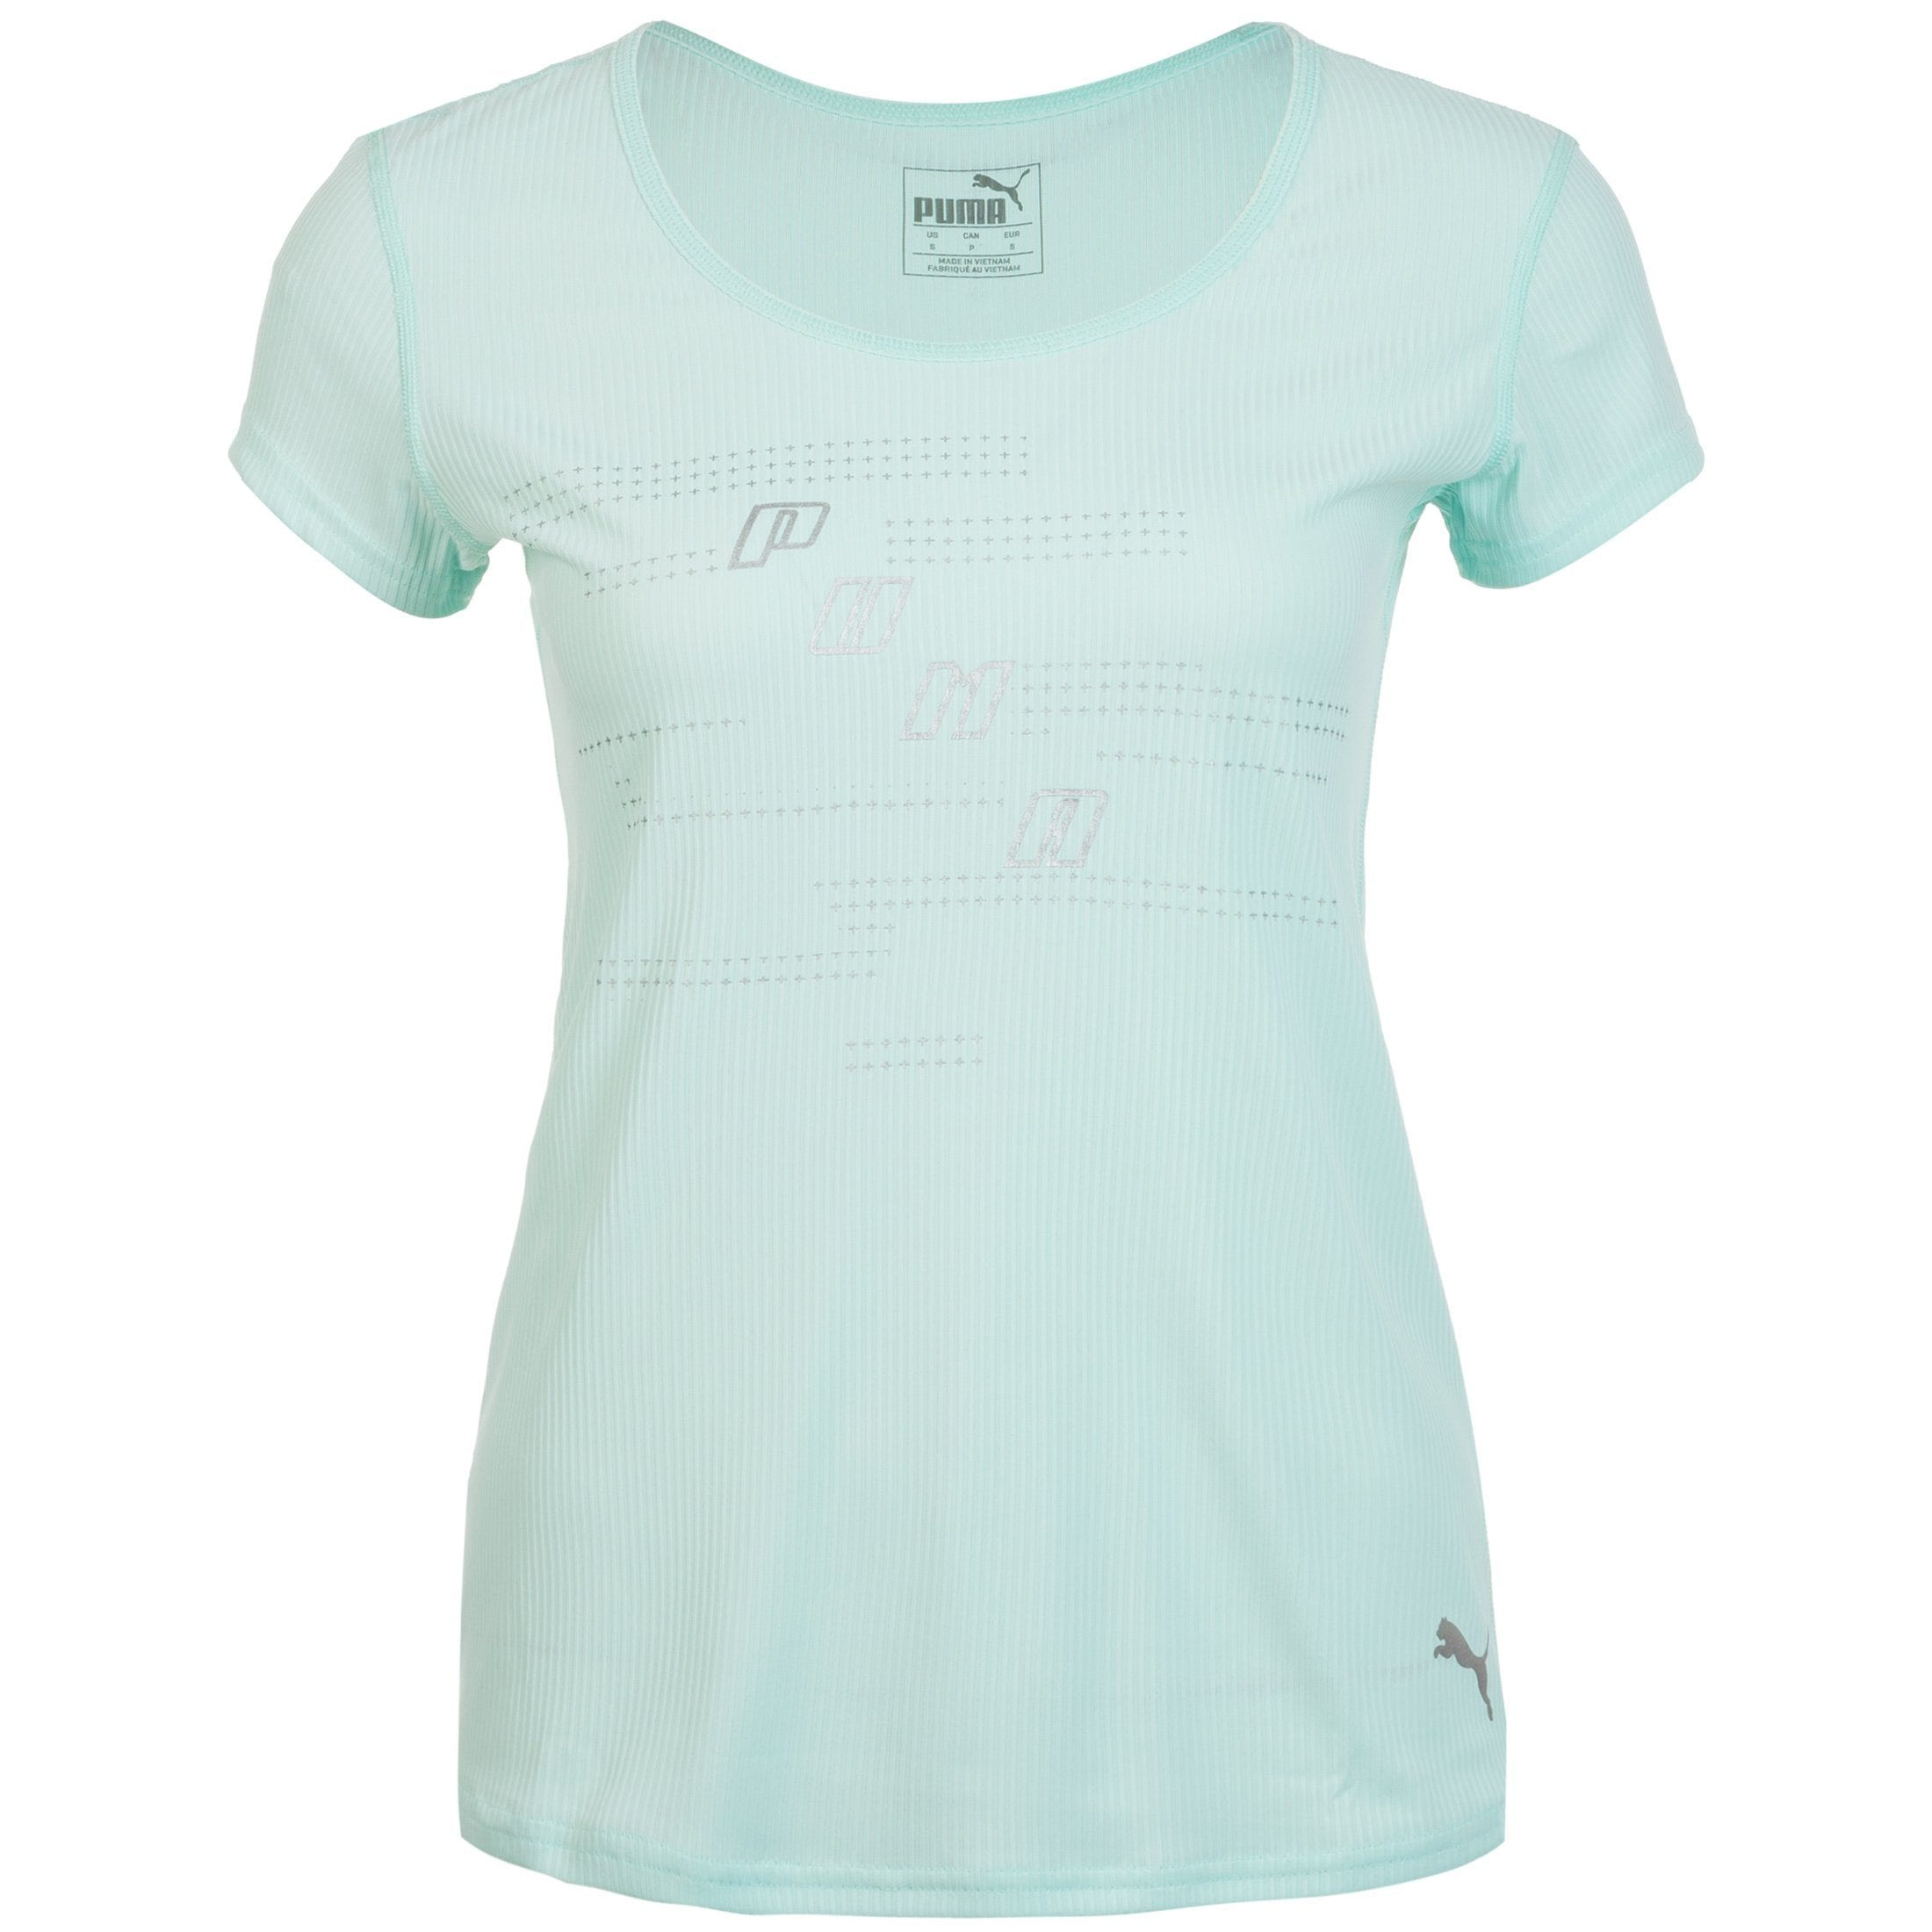 PUMA Laufshirt Ignite Logo   Sportbekleidung > Sportshirts > Laufshirts   Grün   Puma